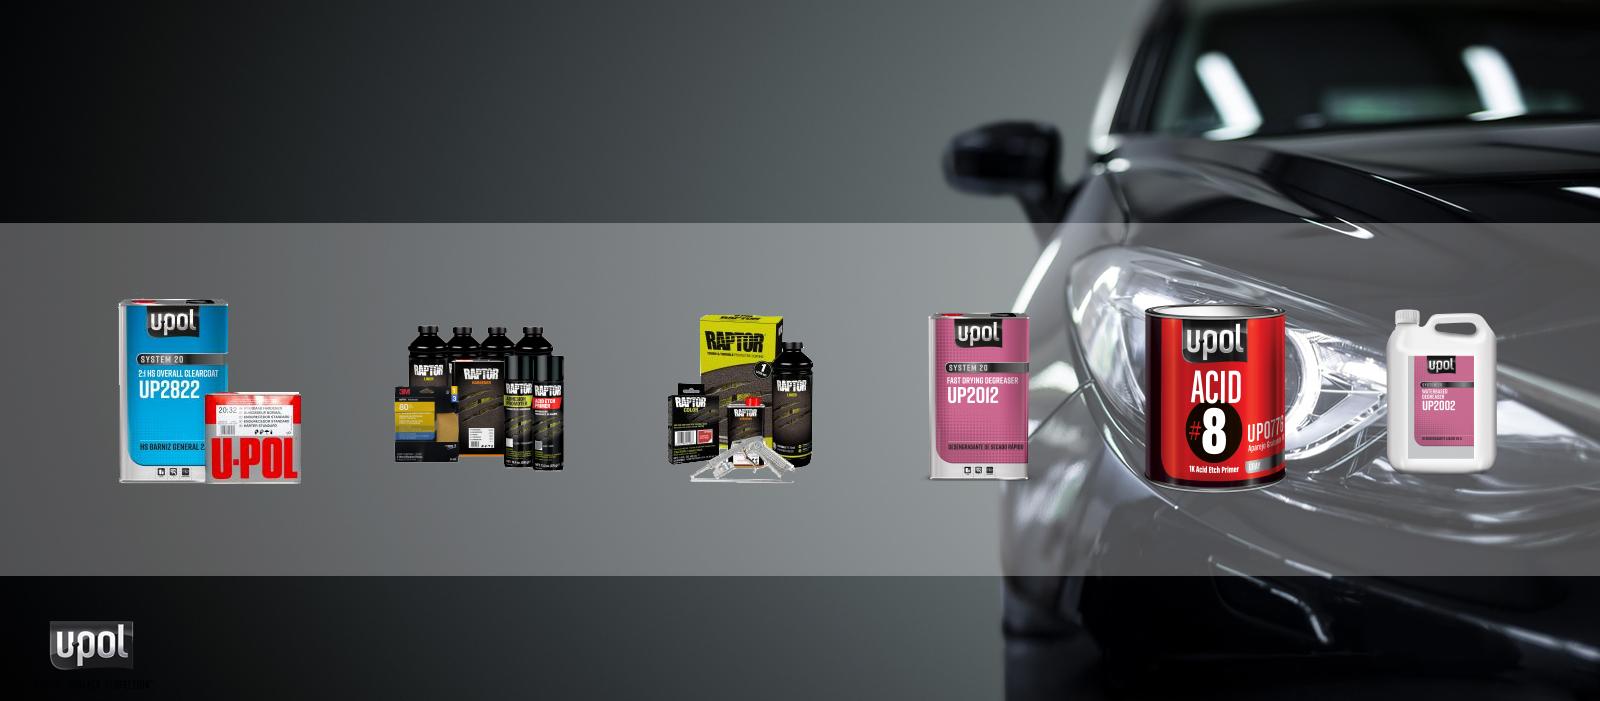 Restomotive - U-POL Products for Sale